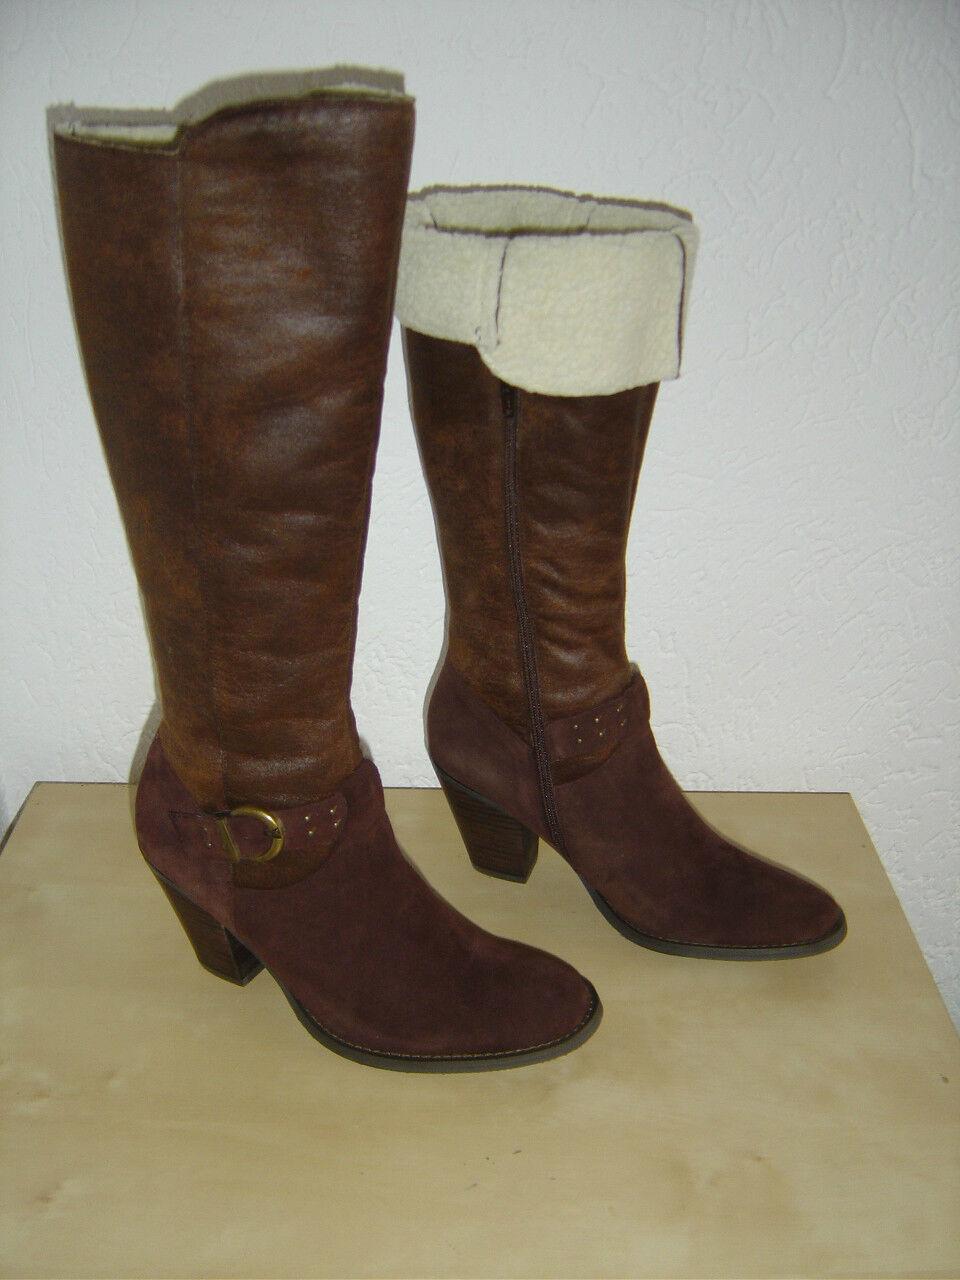 Zapatos especiales con descuento Original American Eagle Stiefel Boots Westernboots Dunkelbraun EUR Gr. 40 NEU